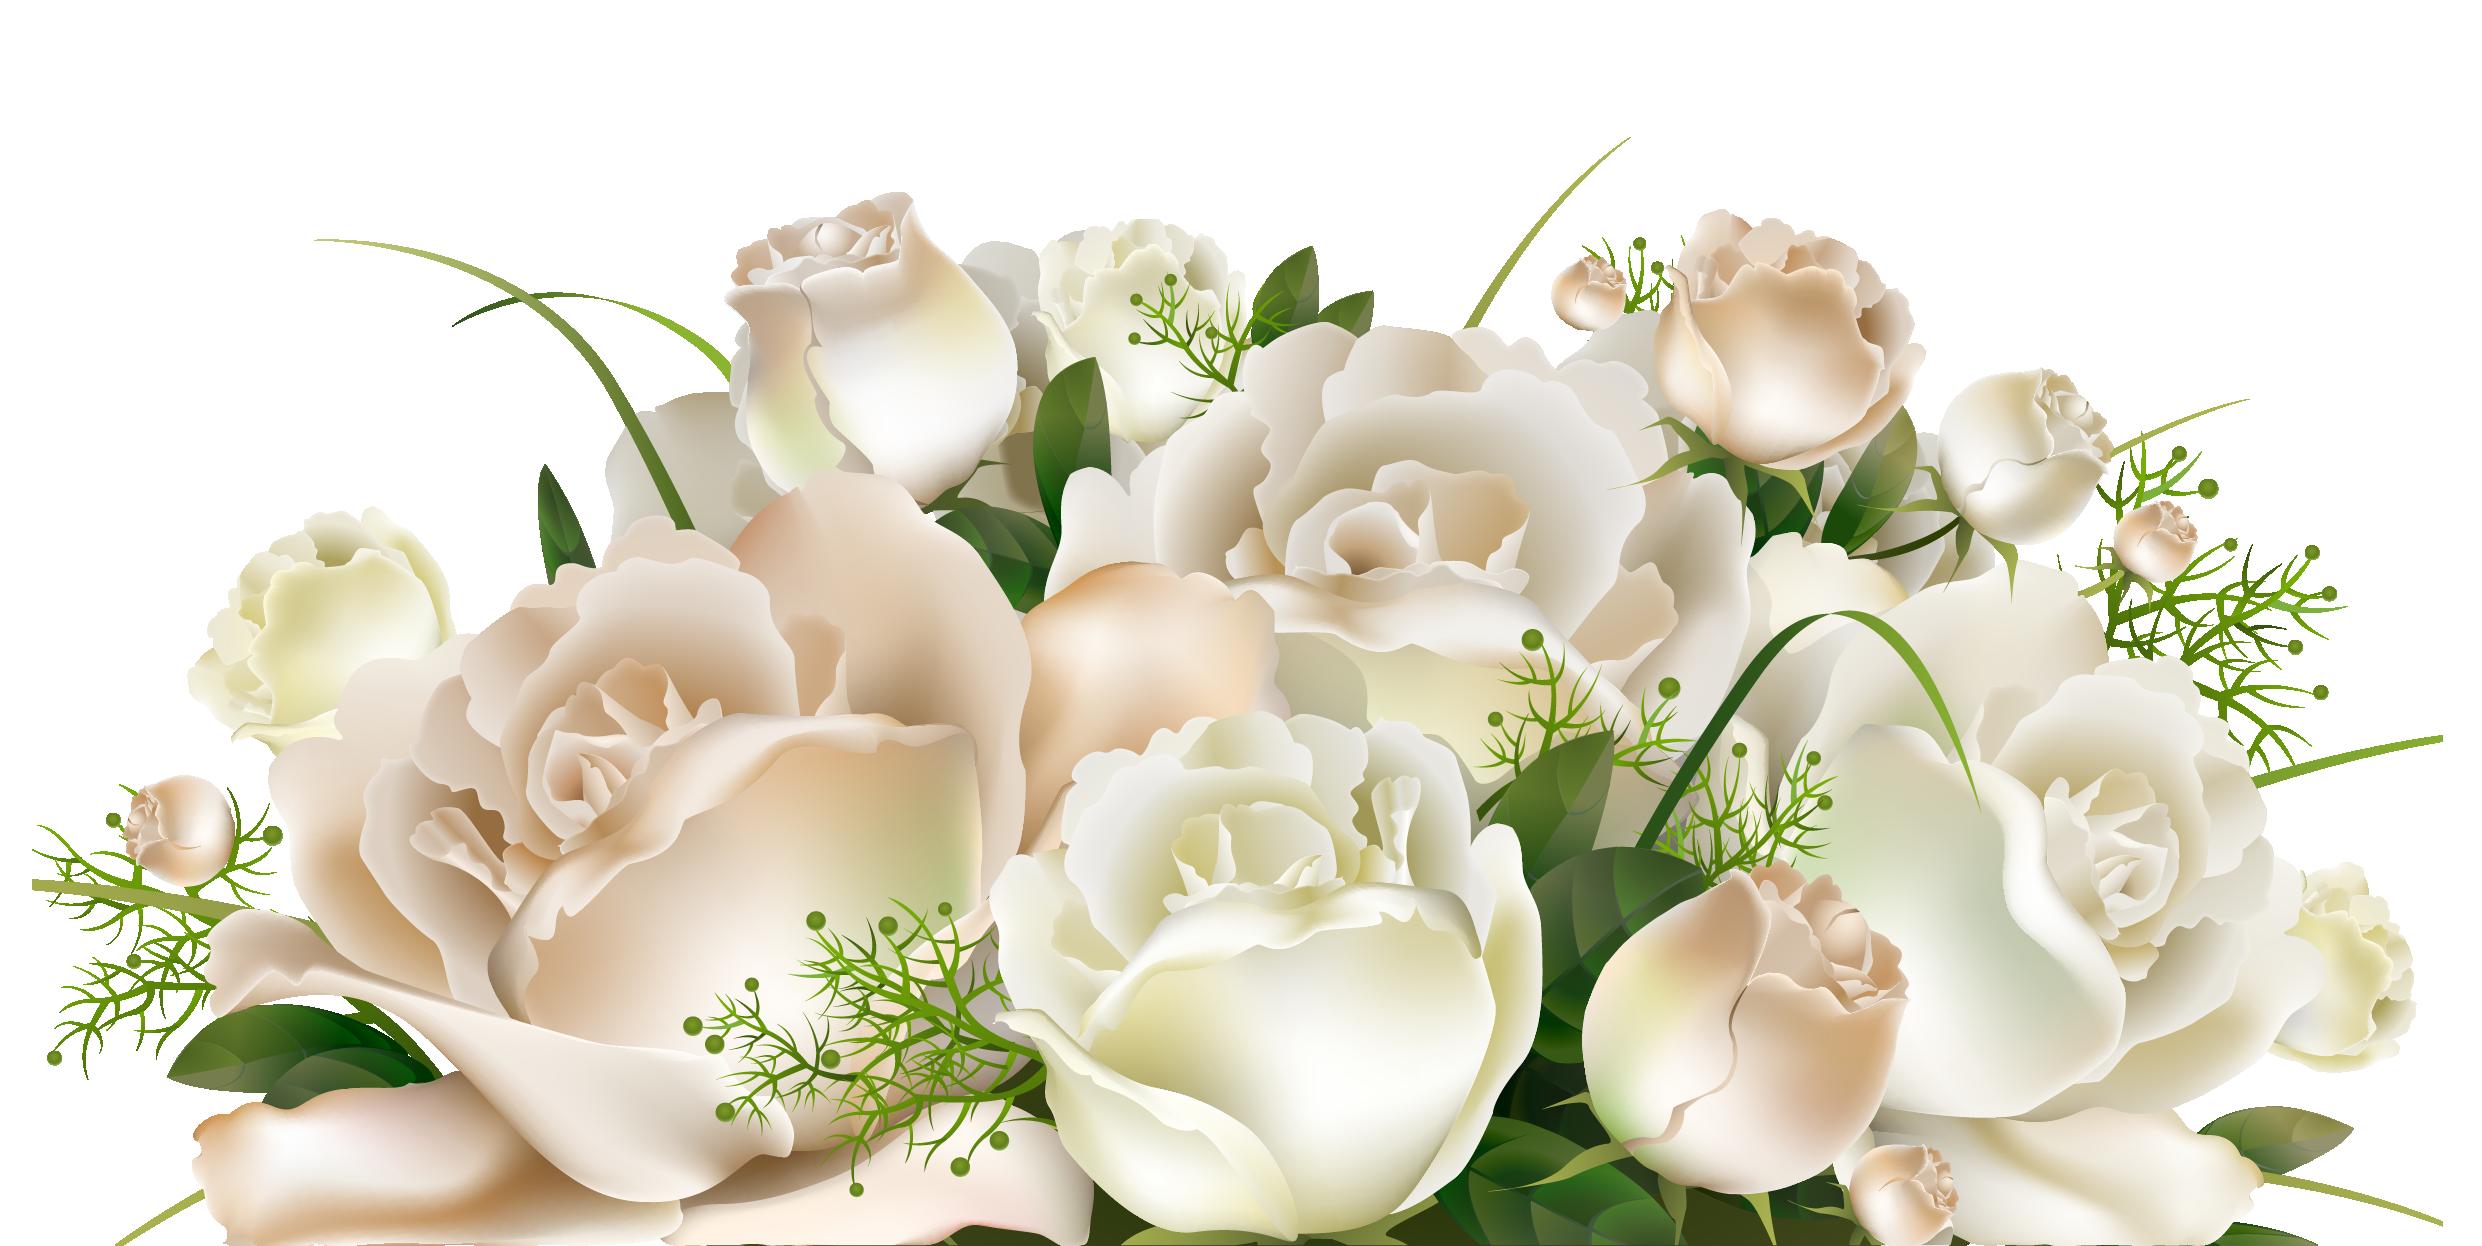 Download White Rose Bucket Png 20075 Transparentpng